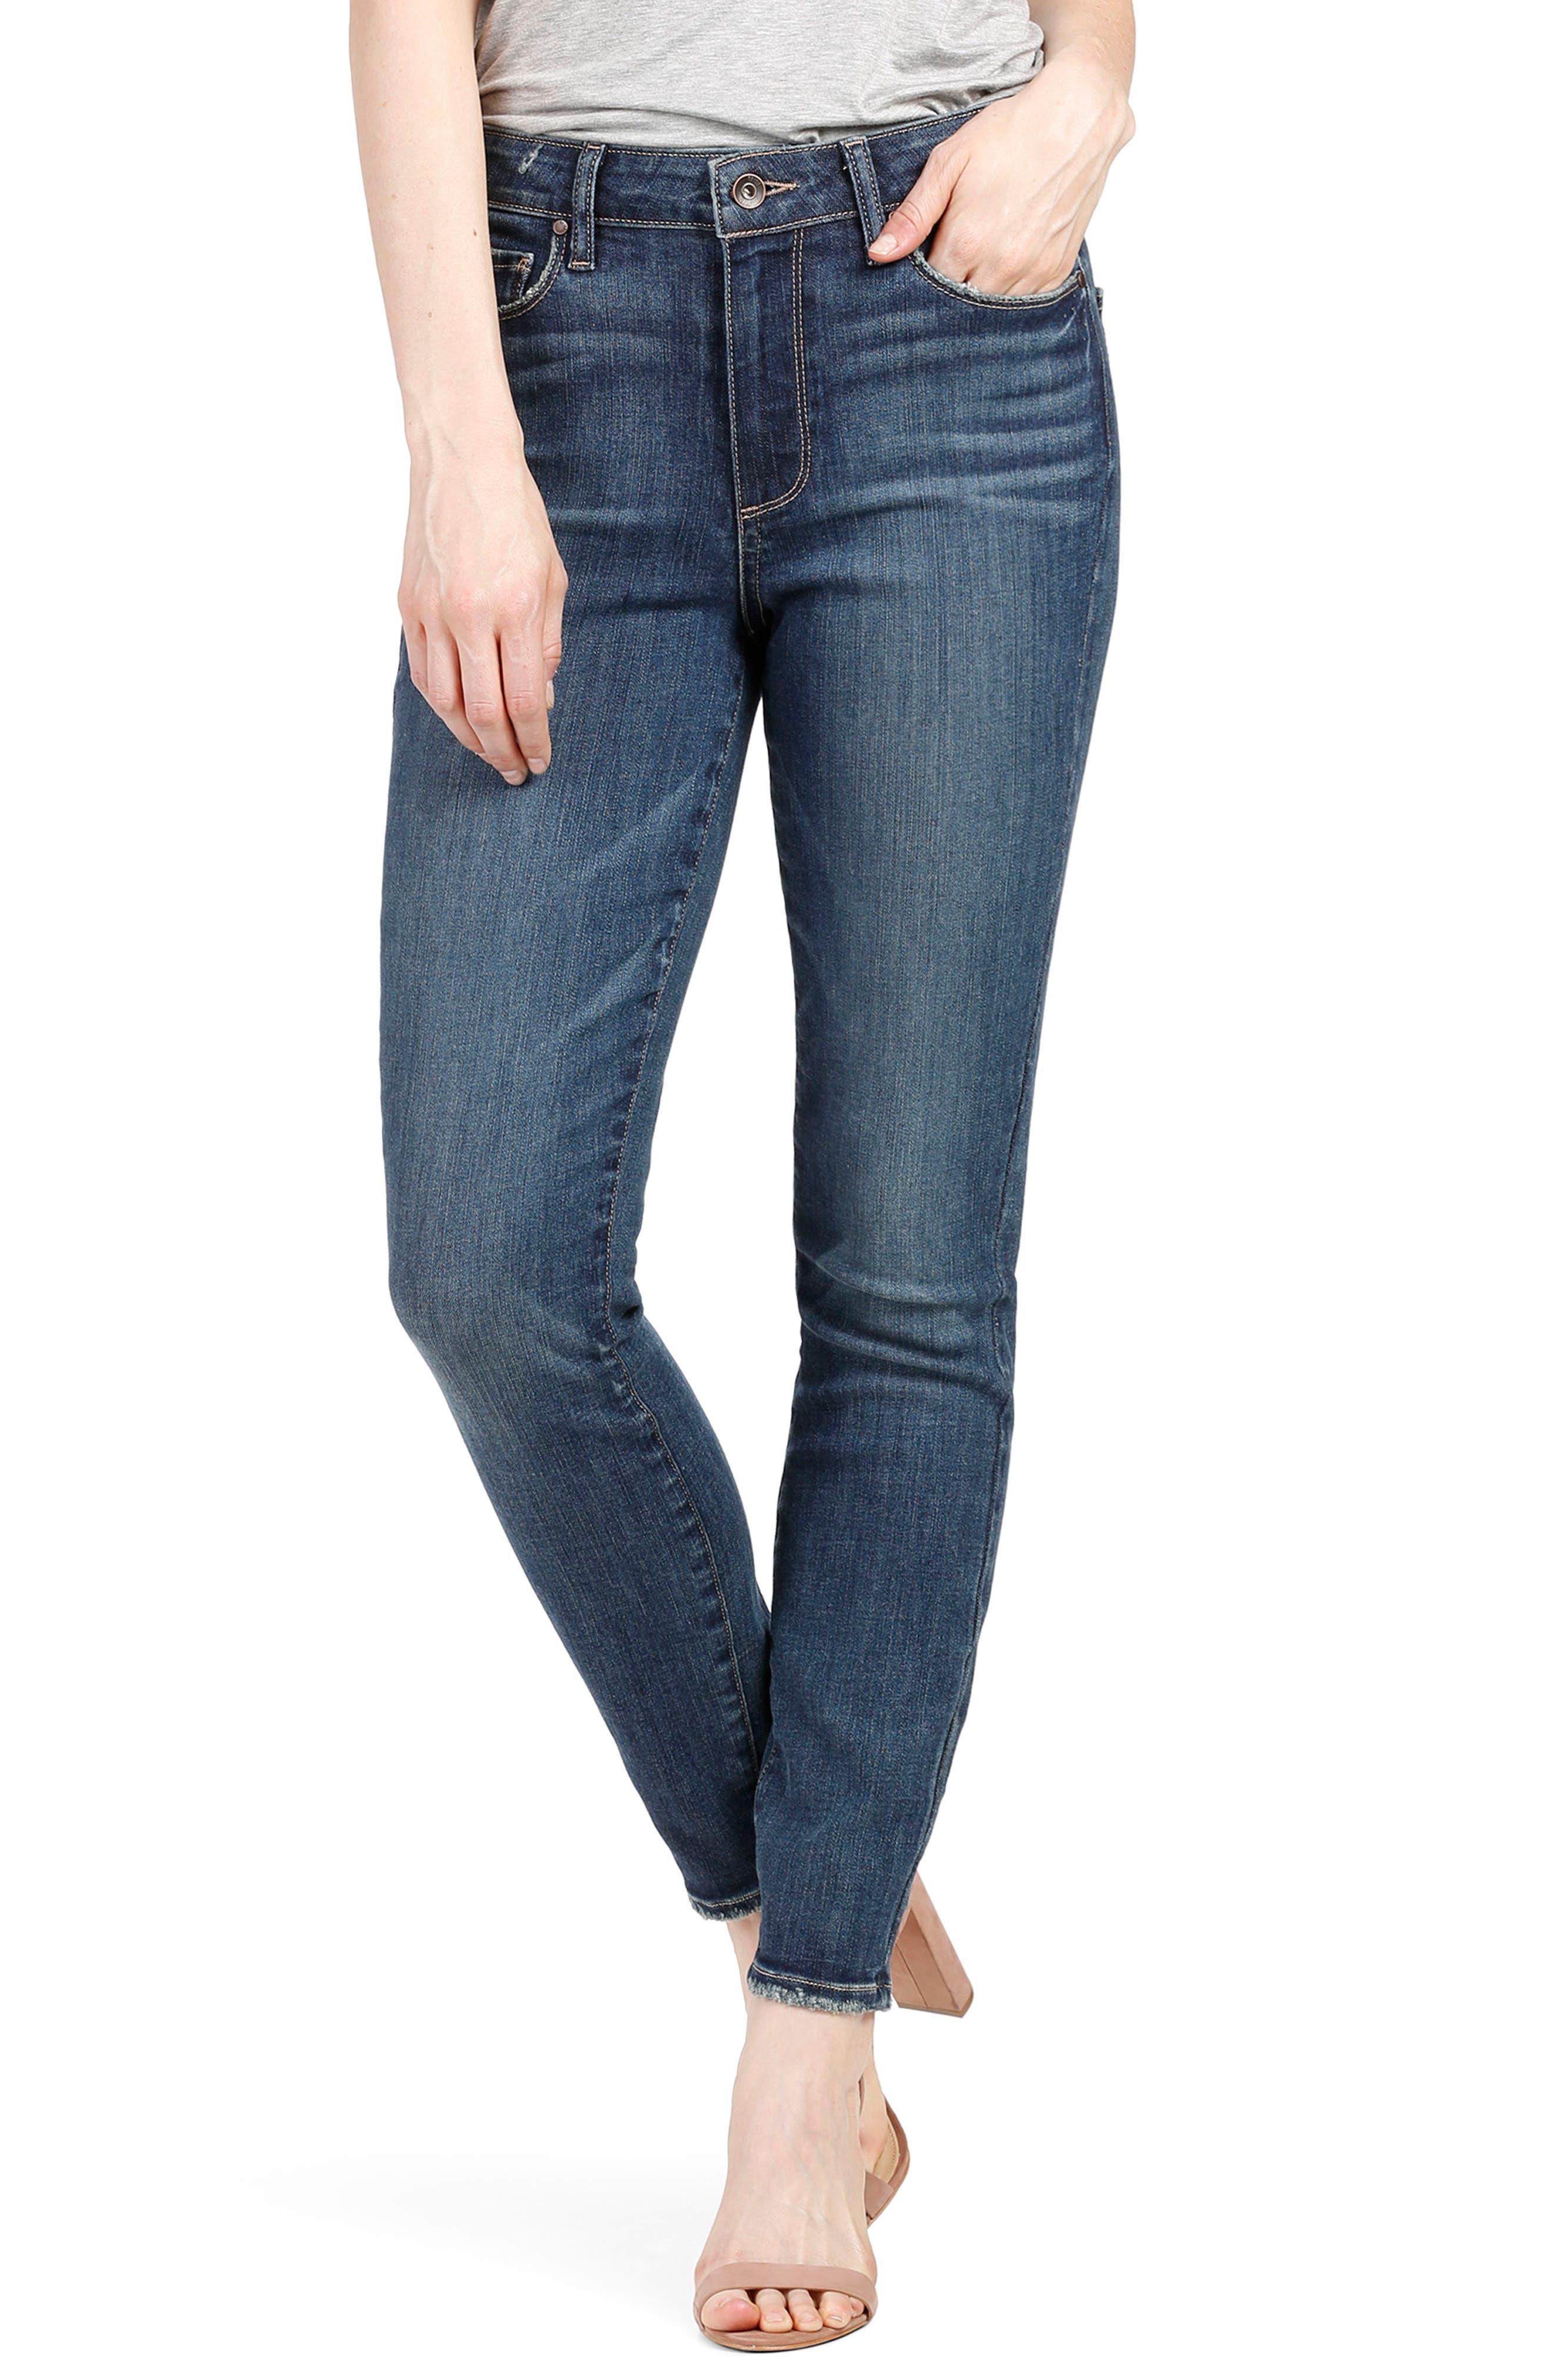 cfb2d5b648911 Paige Transcend Vintage - Hoxton High Waist Ankle Skinny Jeans In Emilio